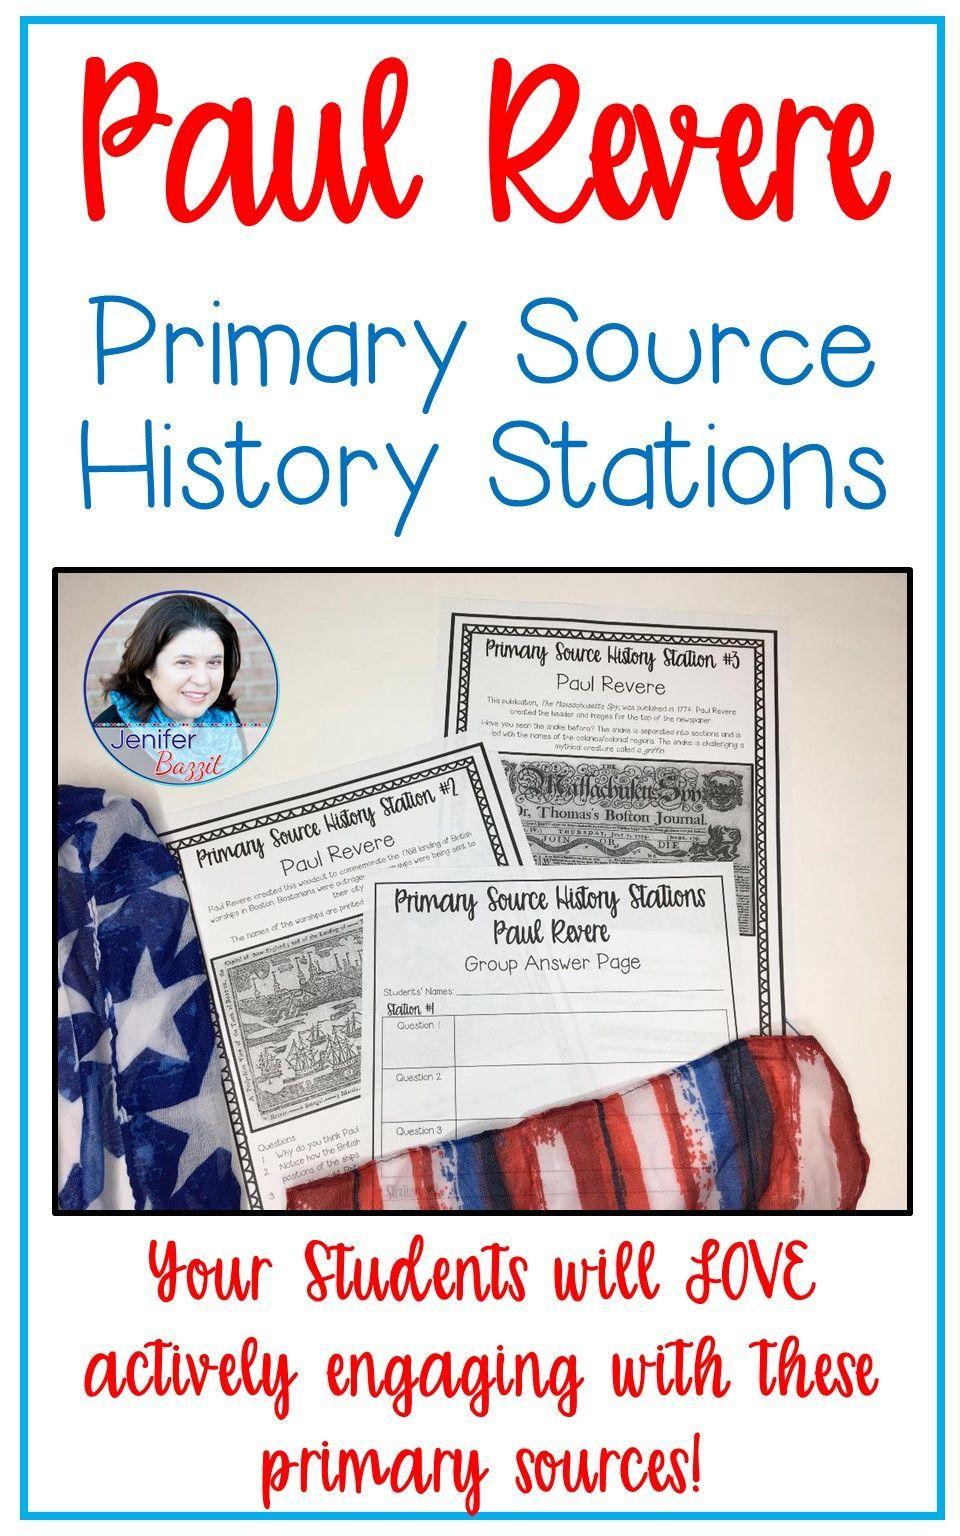 Paul Revere Primary Source History Stations Primary Sources Upper Elementary Social Studies Homeschool Social Studies